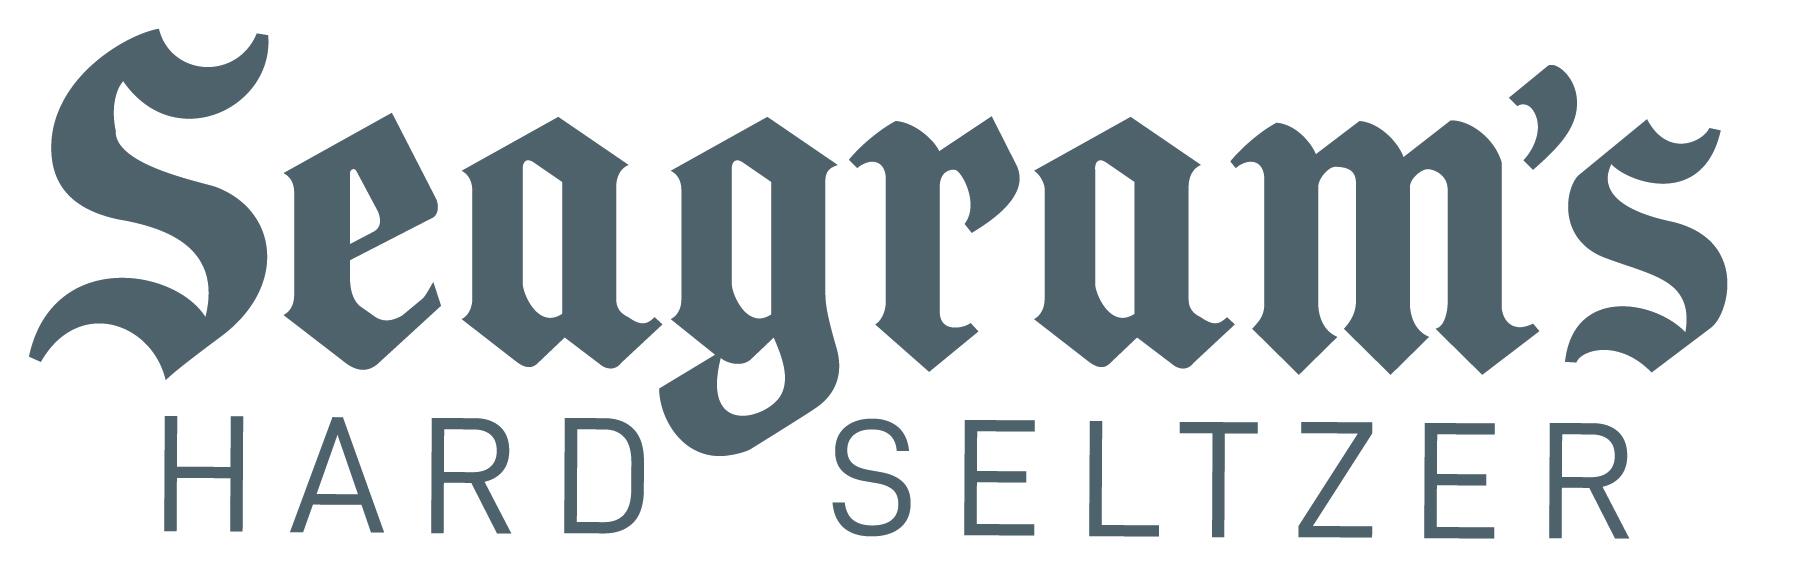 Seagrams Seltzer